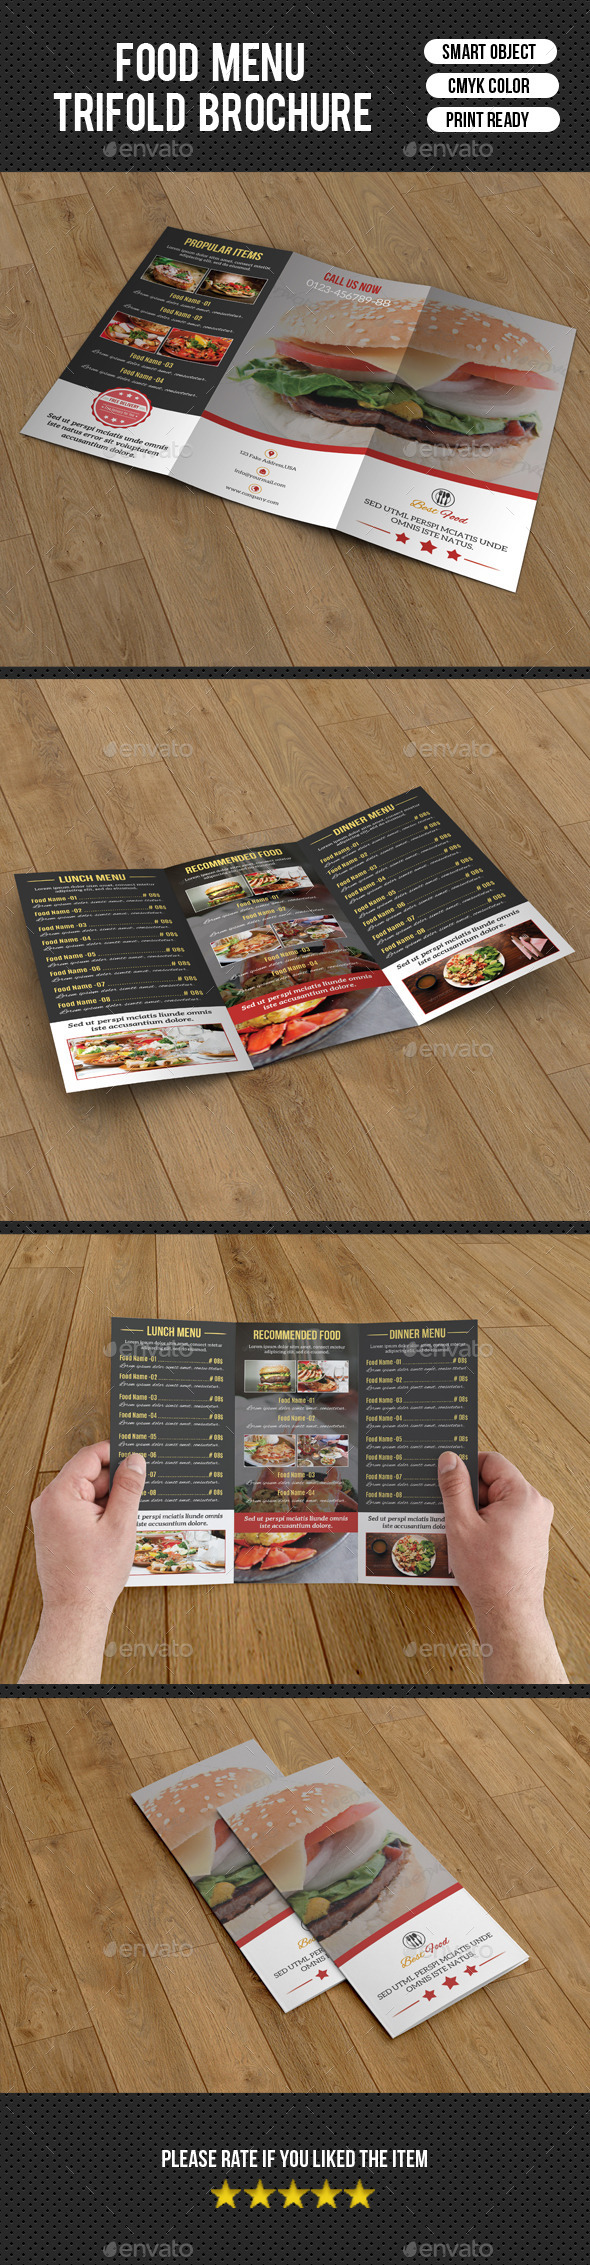 Food Menu Trifold Brochure-V205 - Food Menus Print Templates